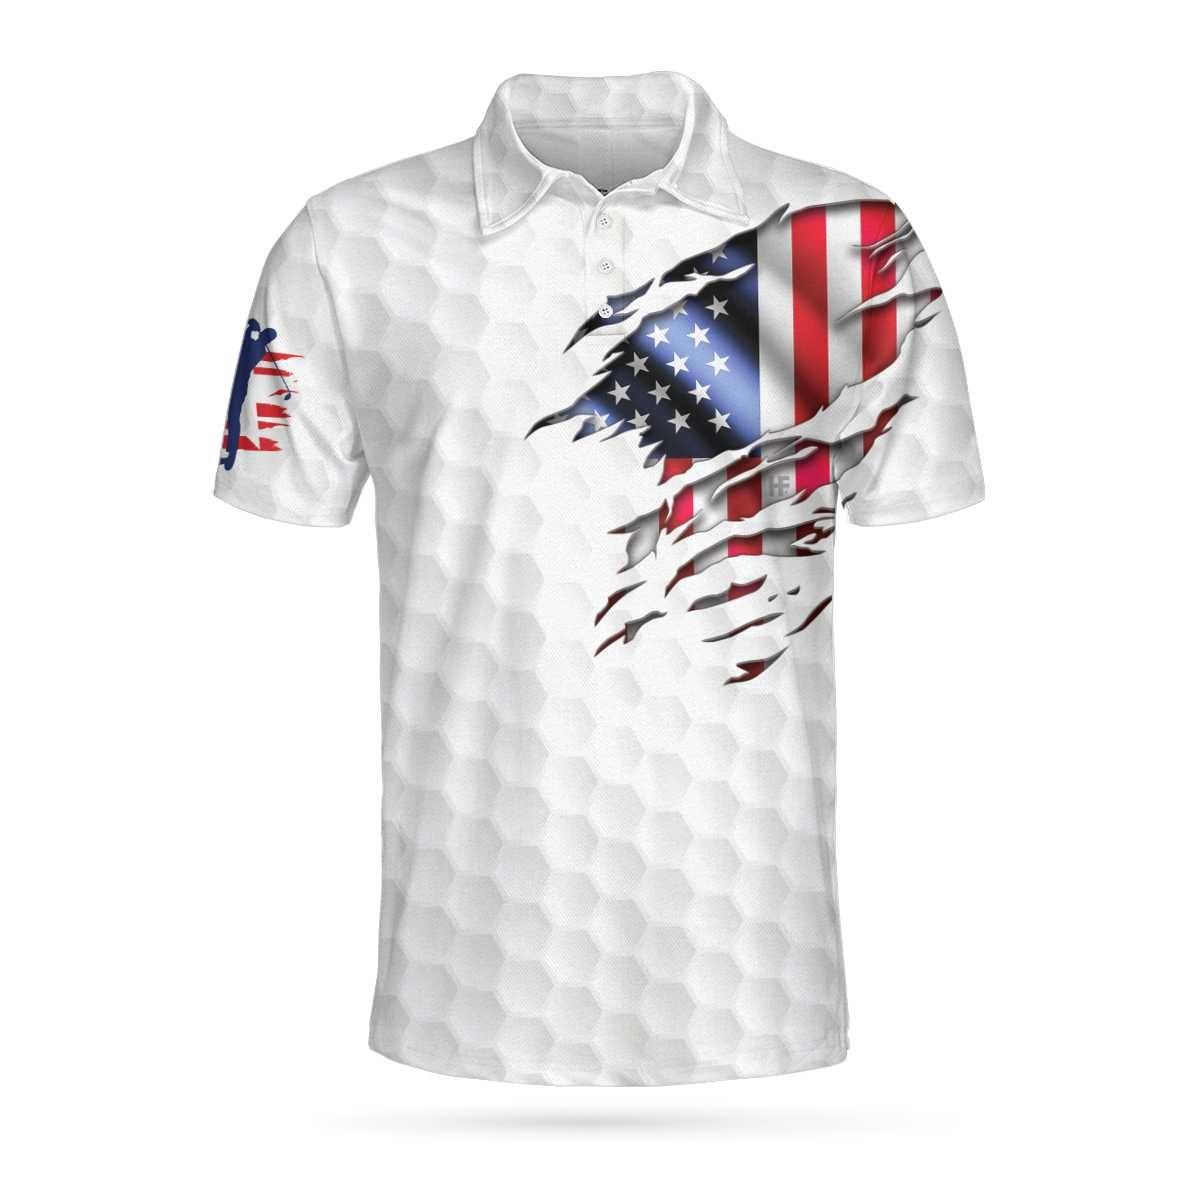 Golf American flag polo shirt4